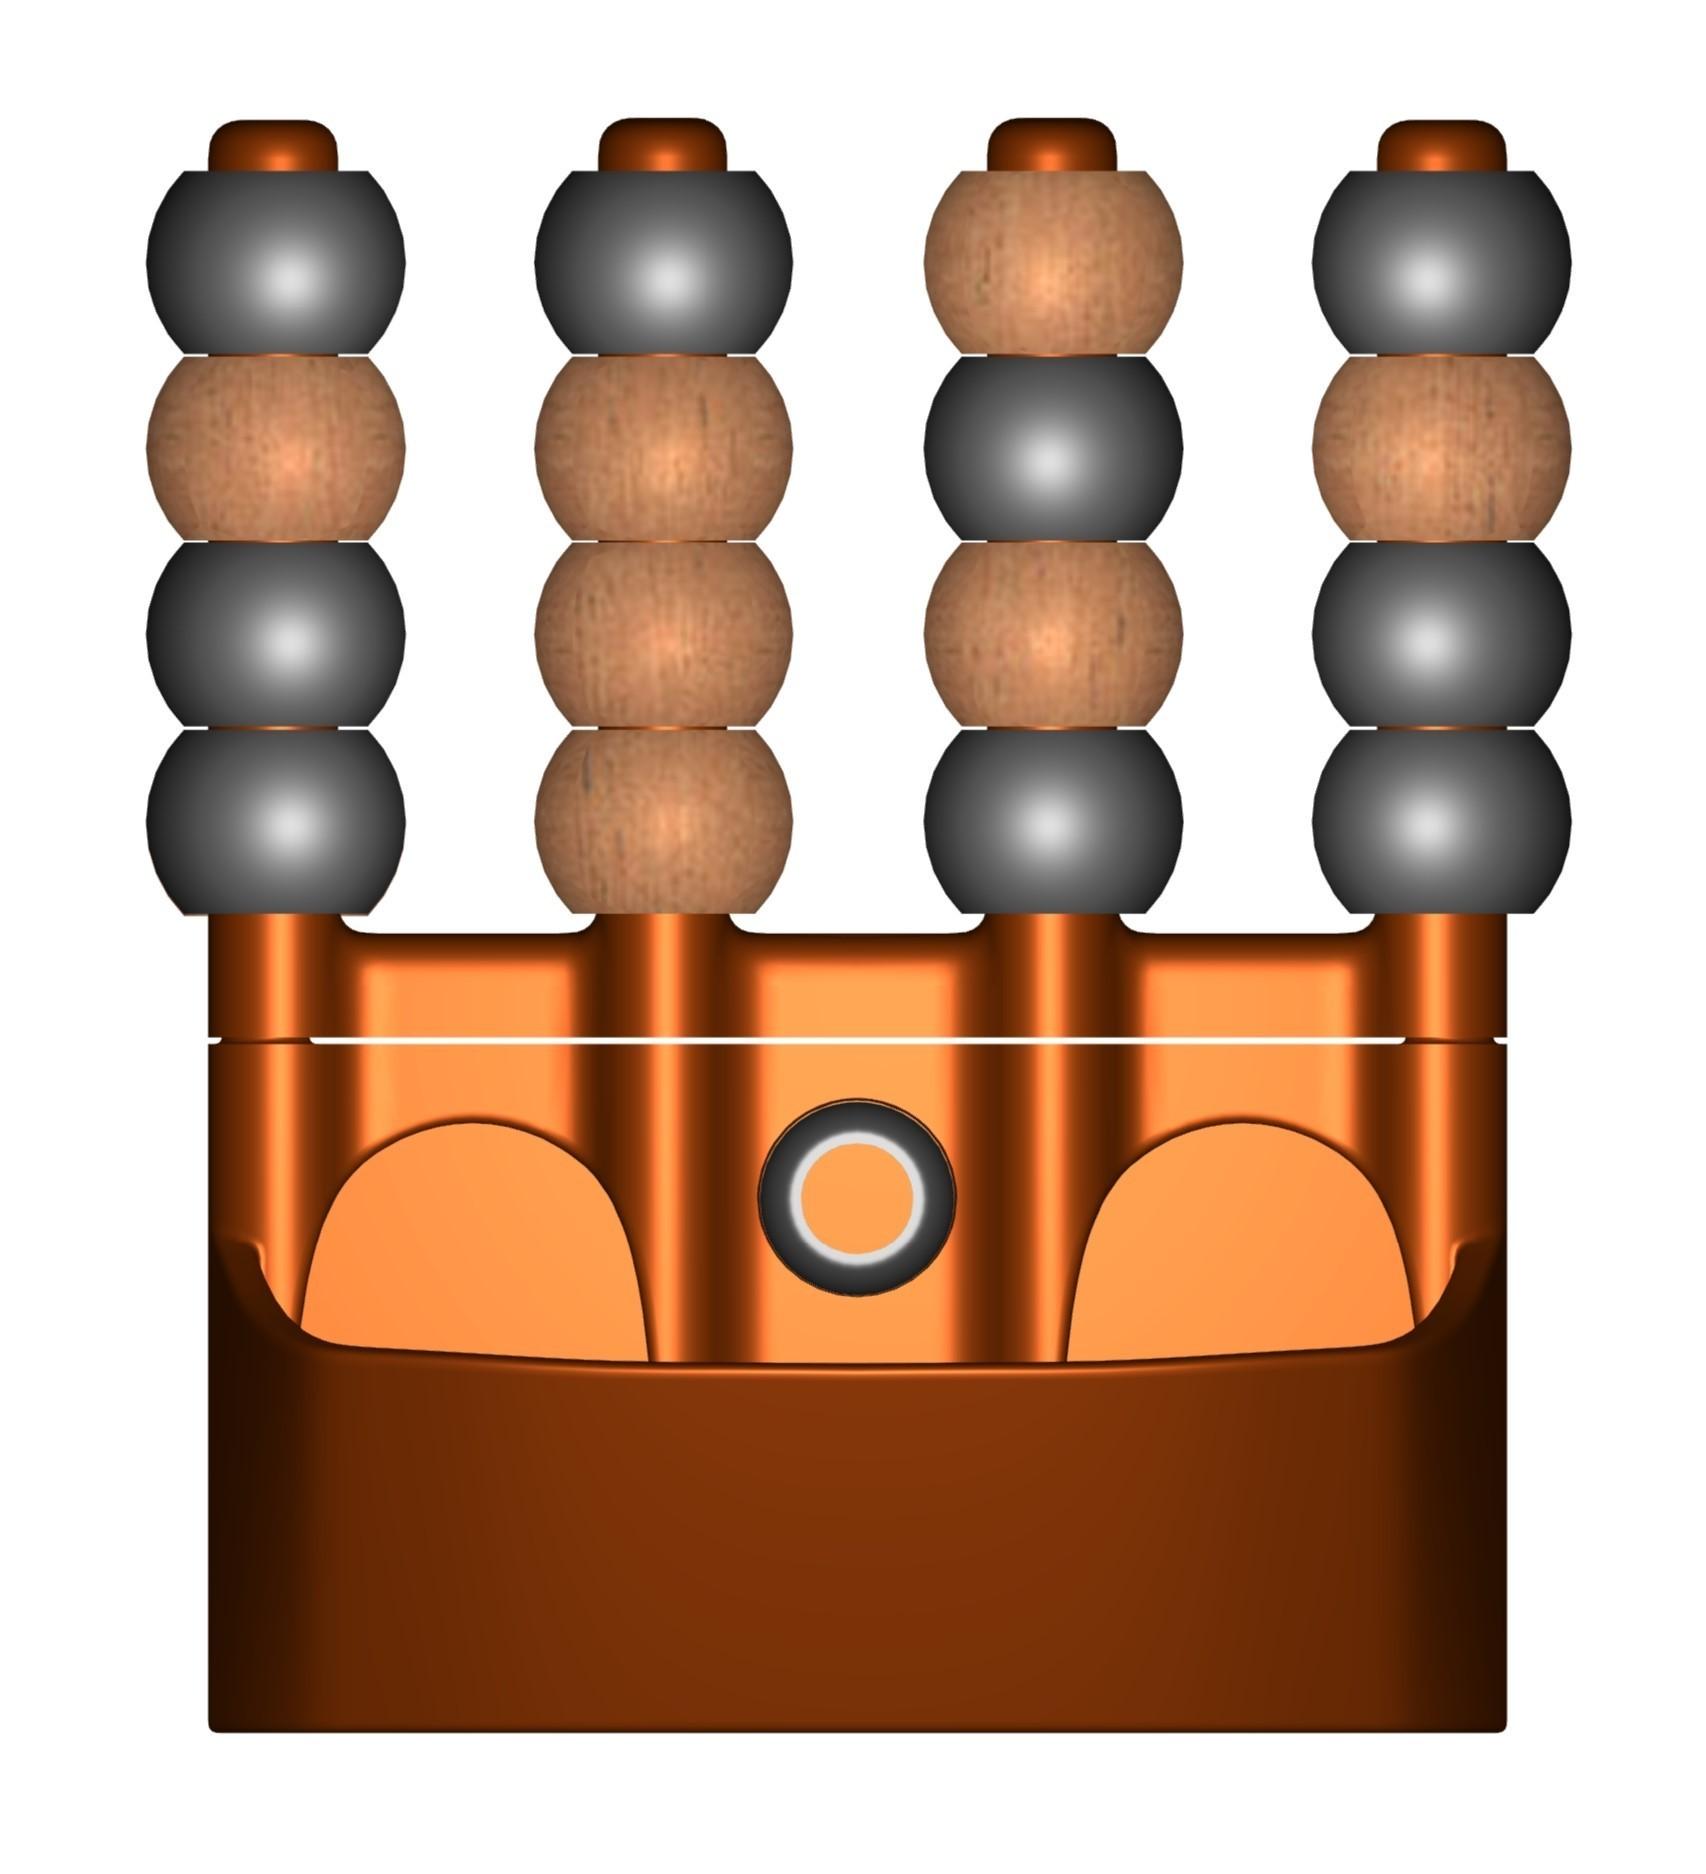 Power 4 pro -7.jpg Download free STL file Pro Power 4 3D • 3D printing object, montaudoneliot